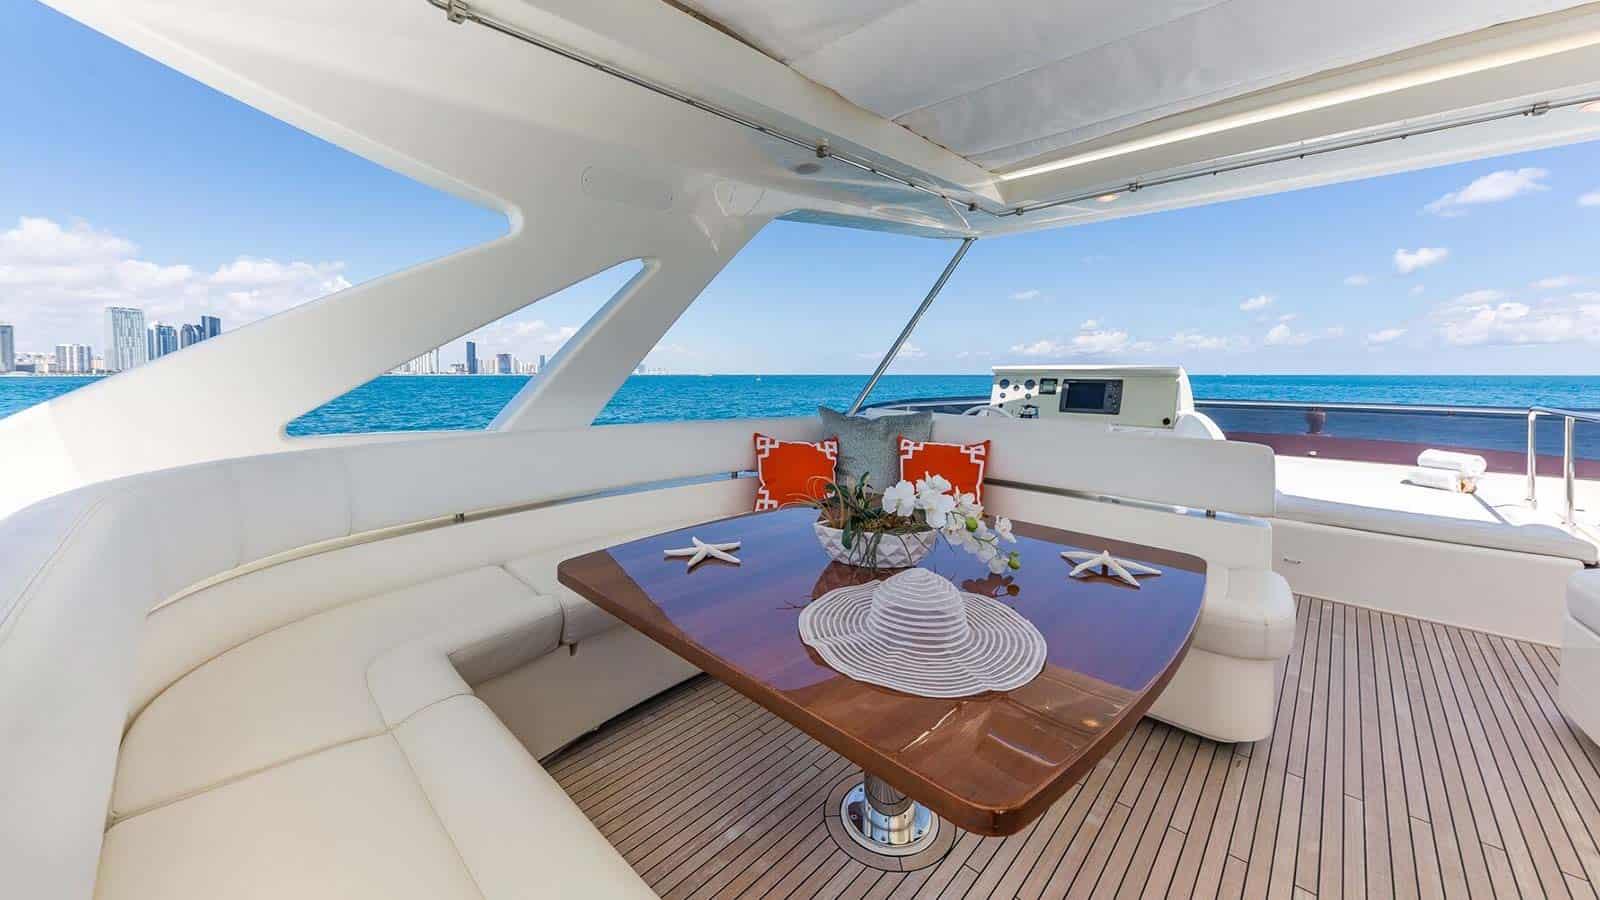 Island Party Miami